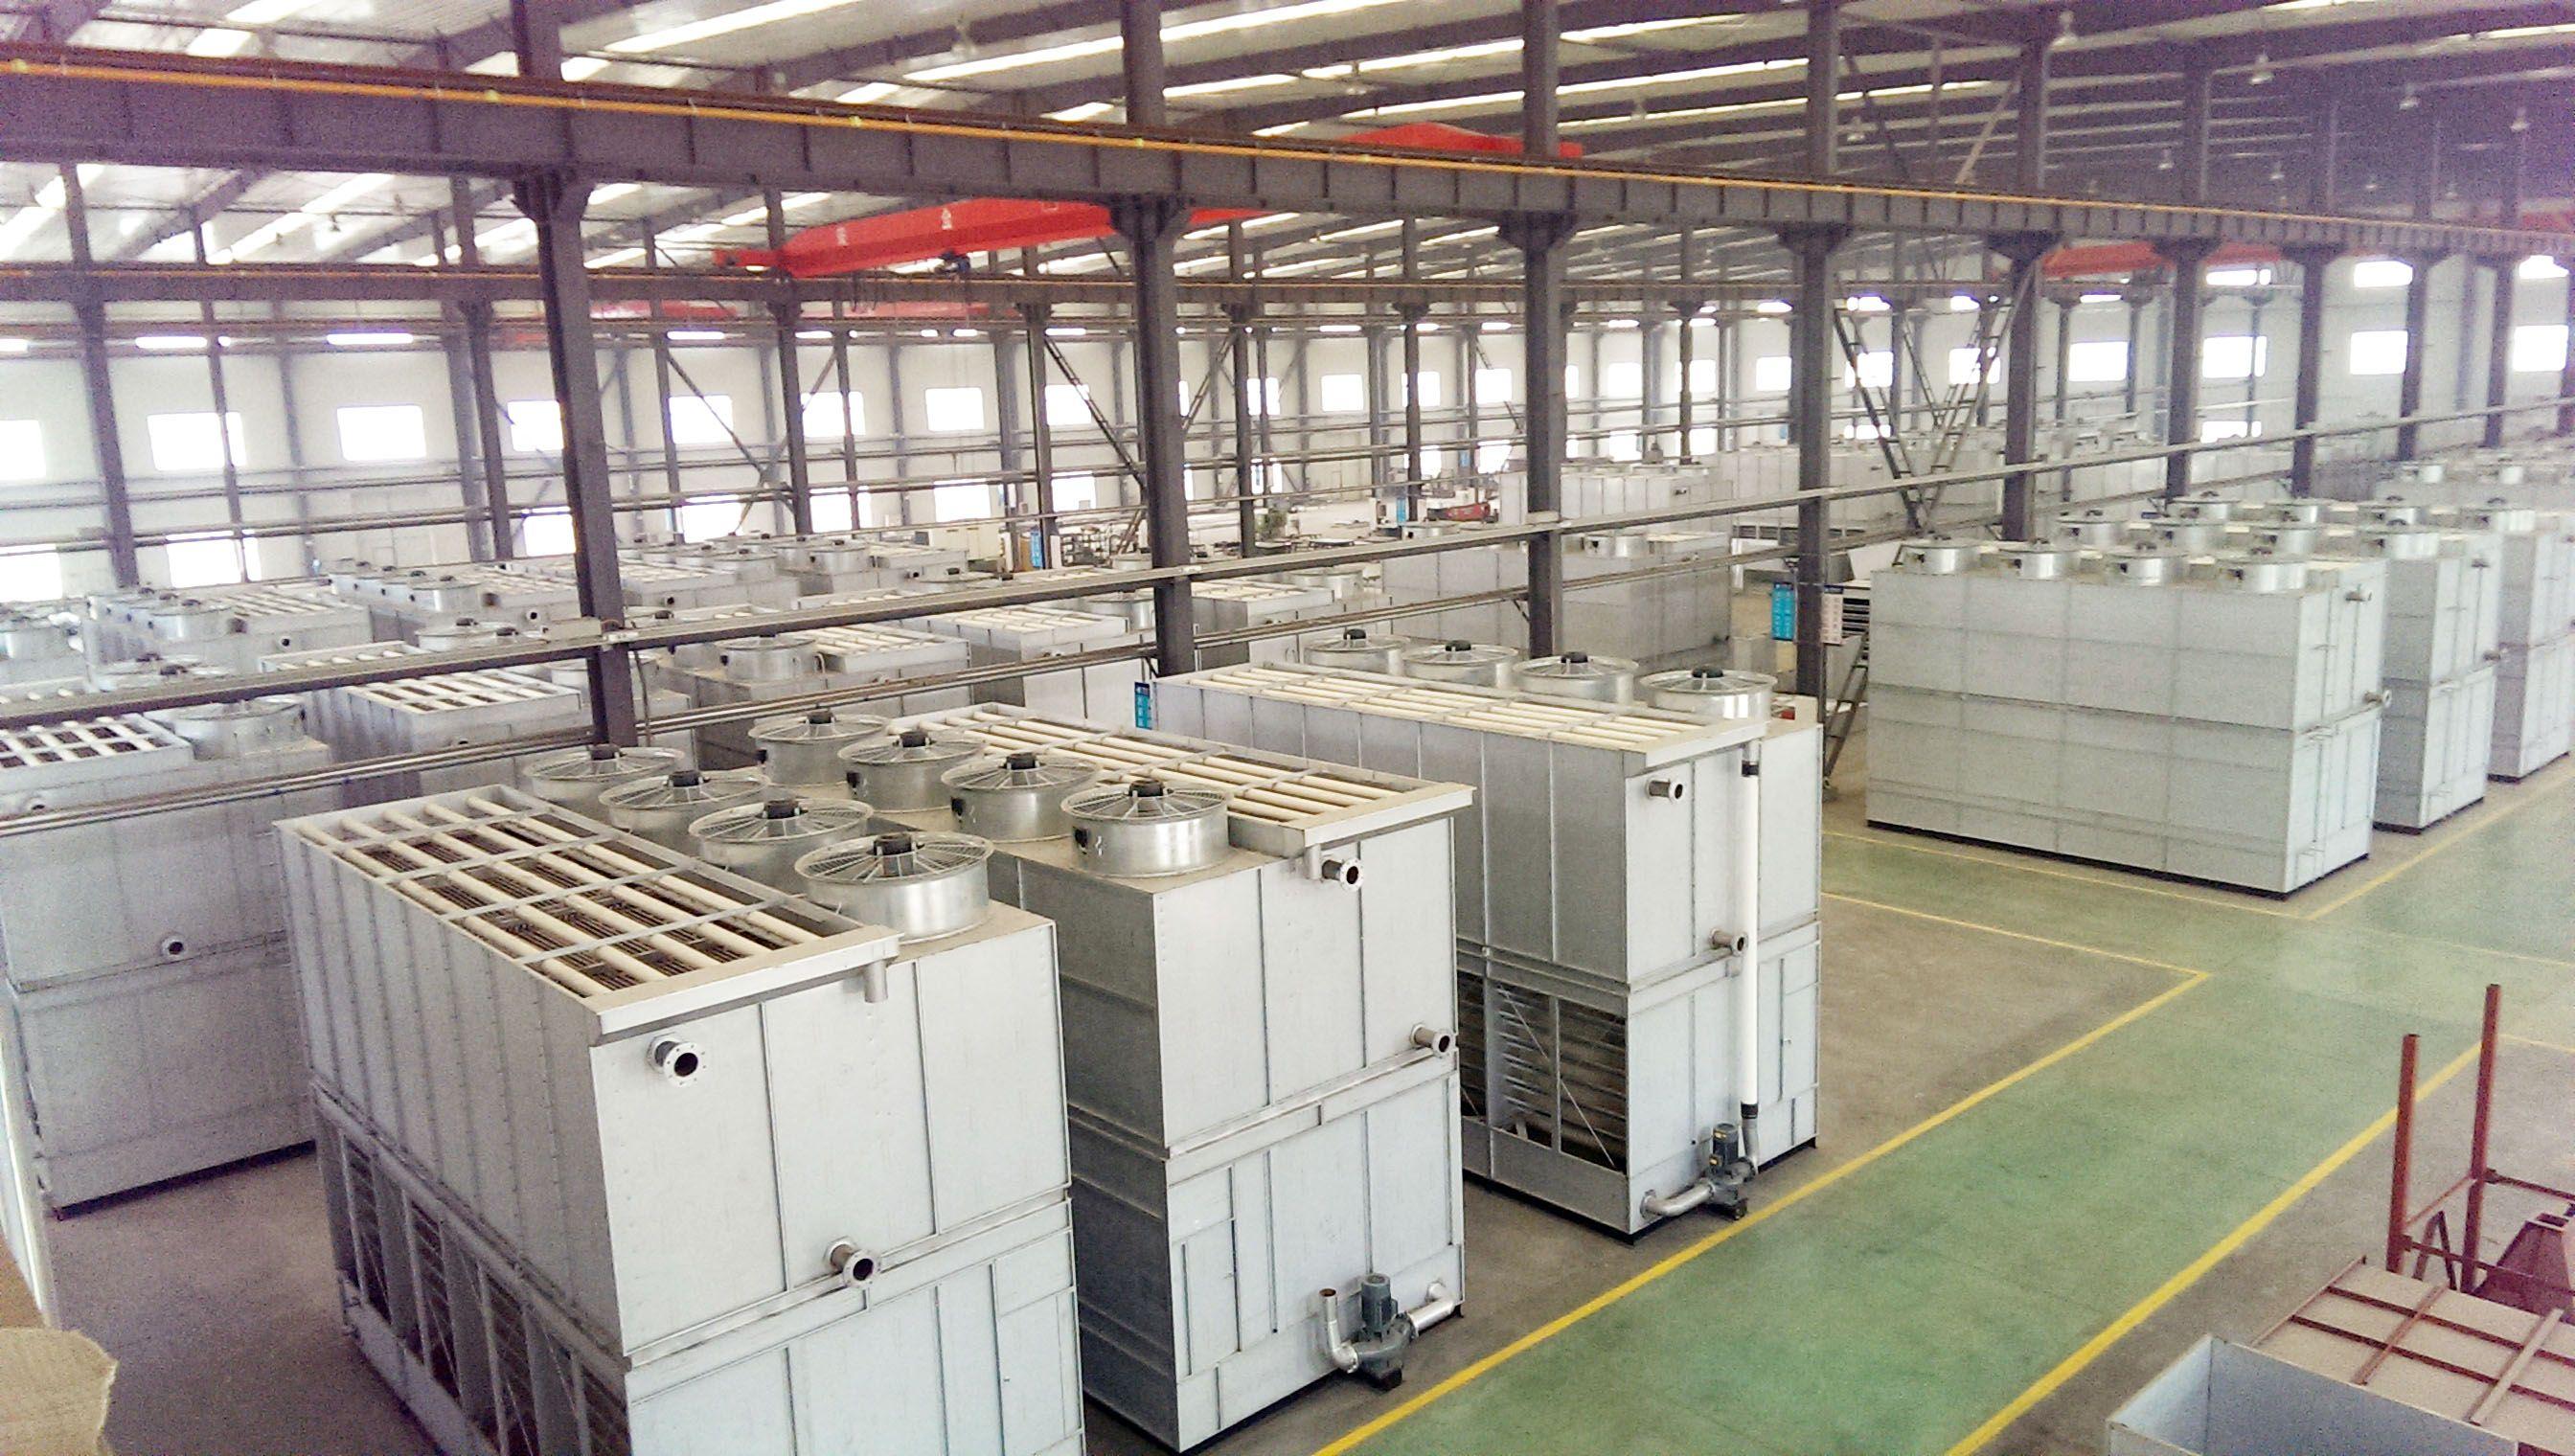 CoolingTower manufacturer, email sales